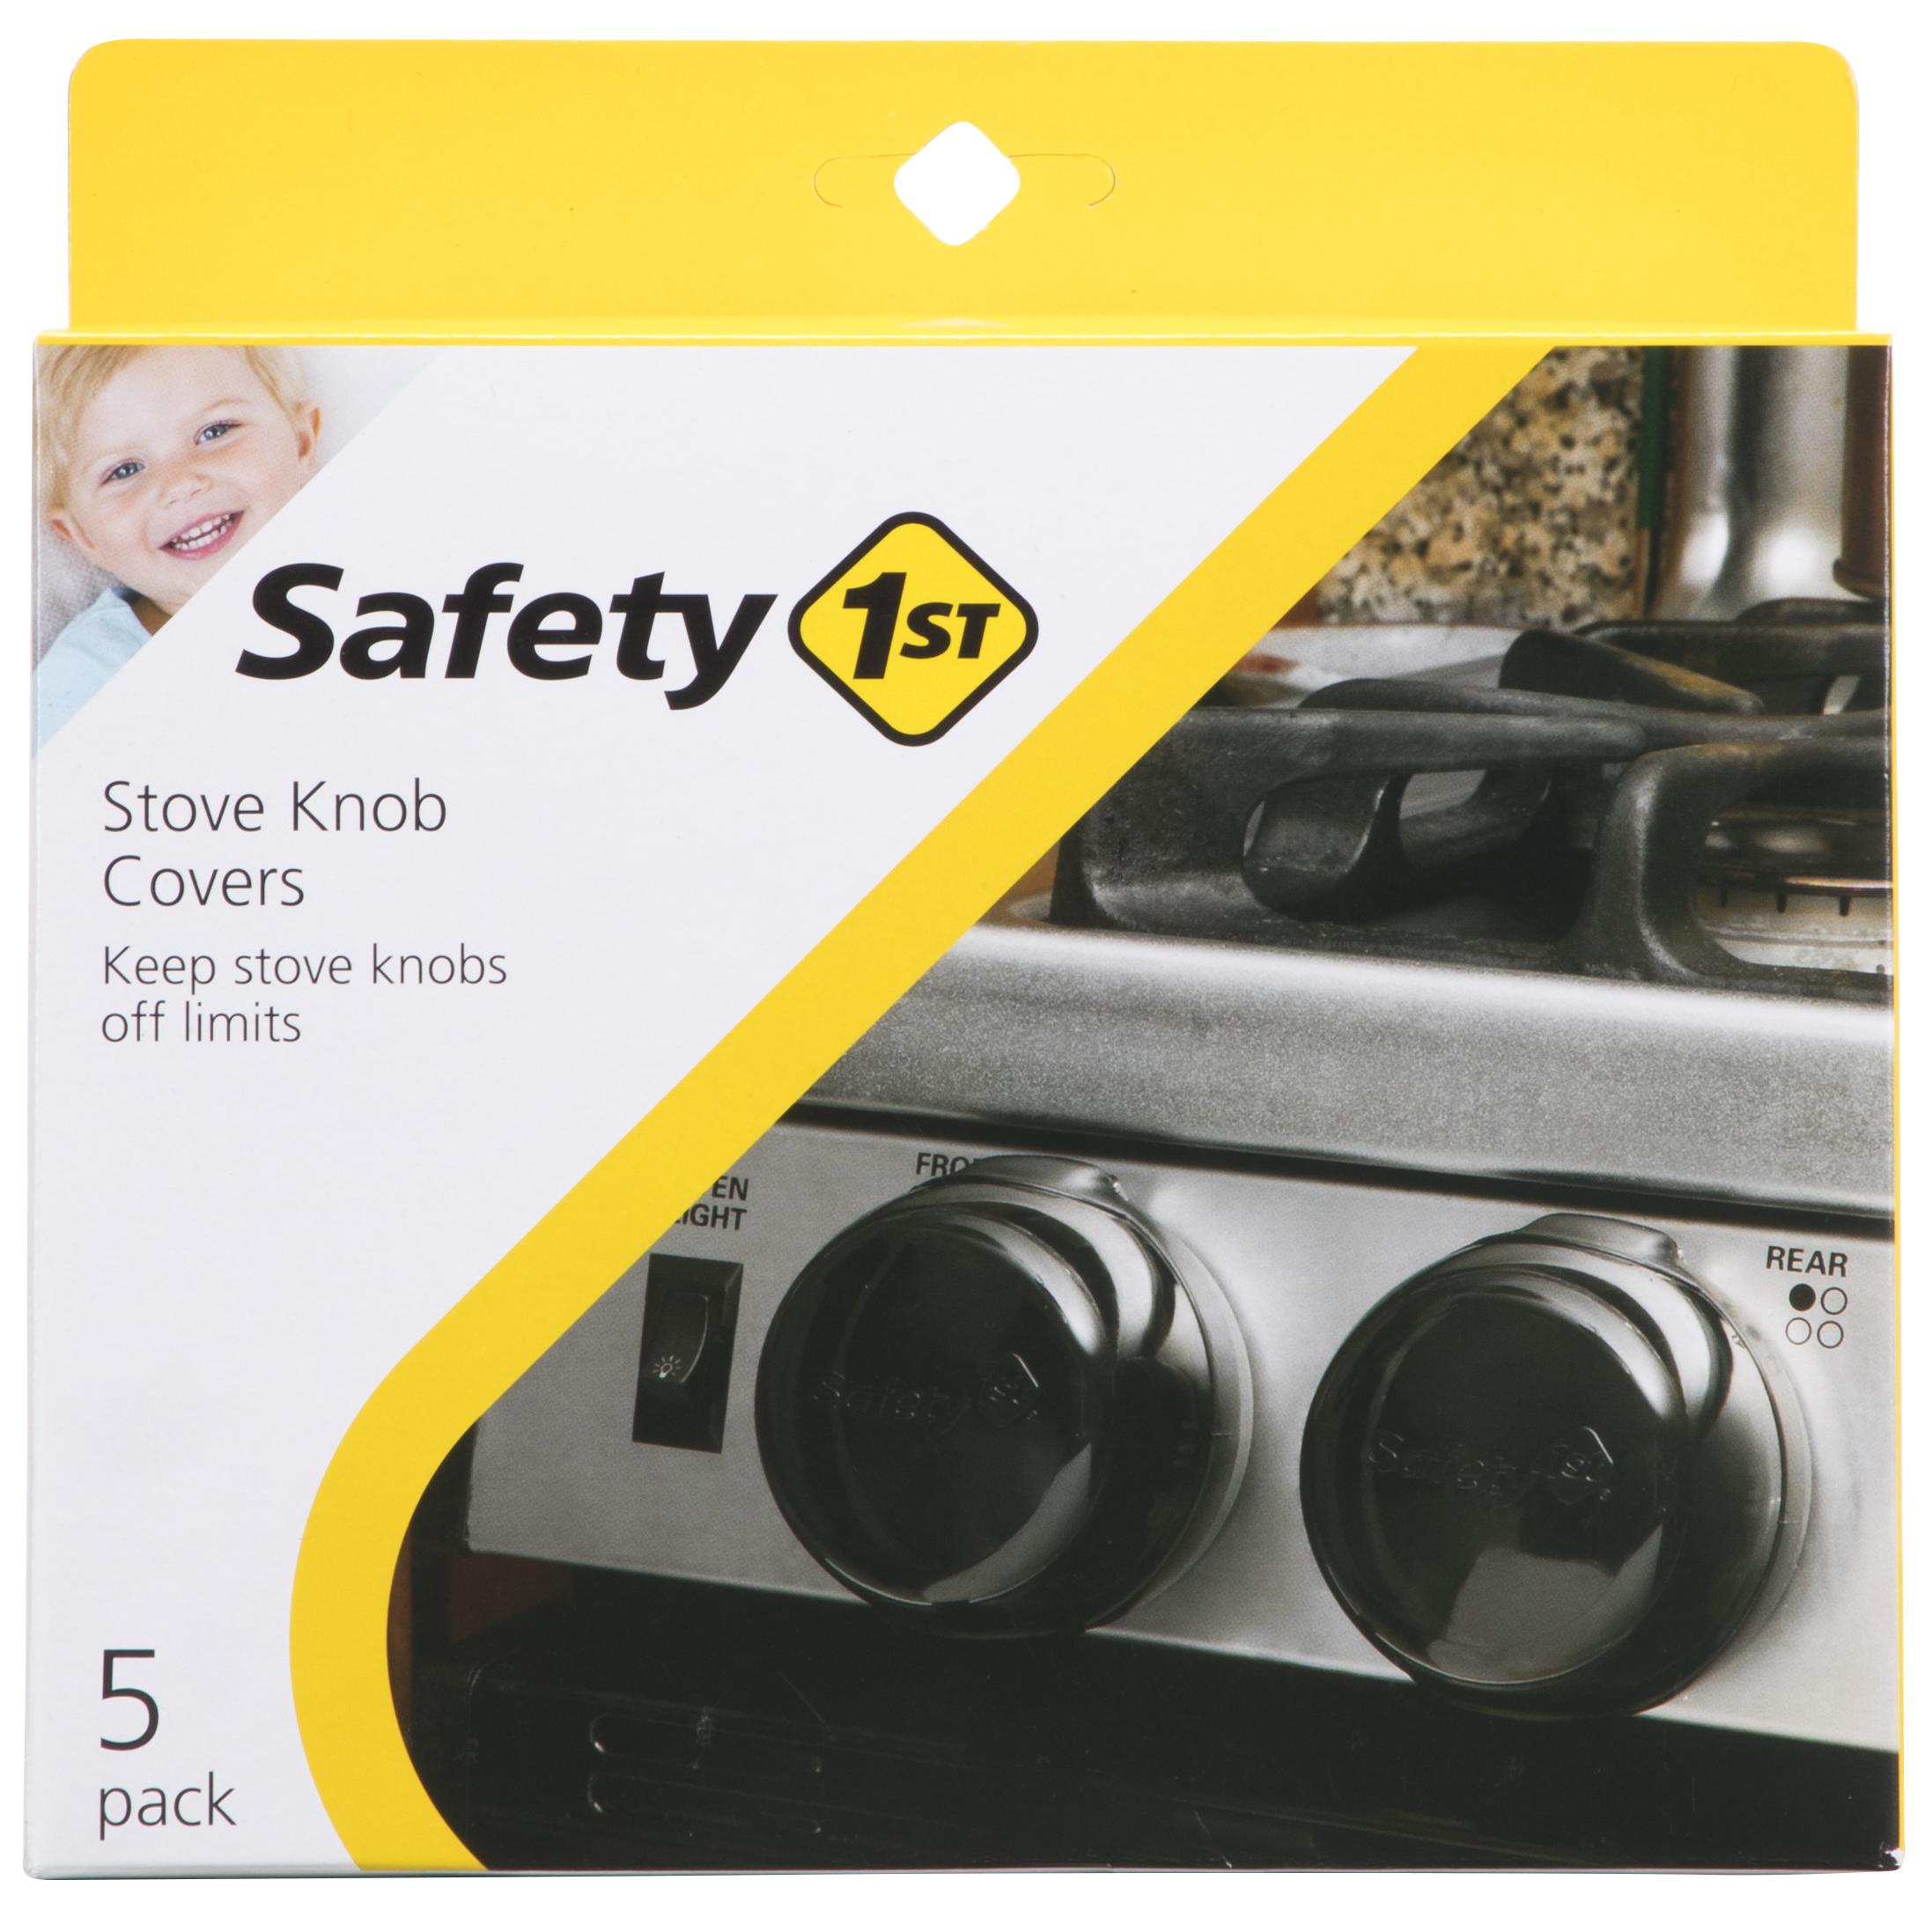 Safety 1st Universal Design Stove Knob Covers, Black